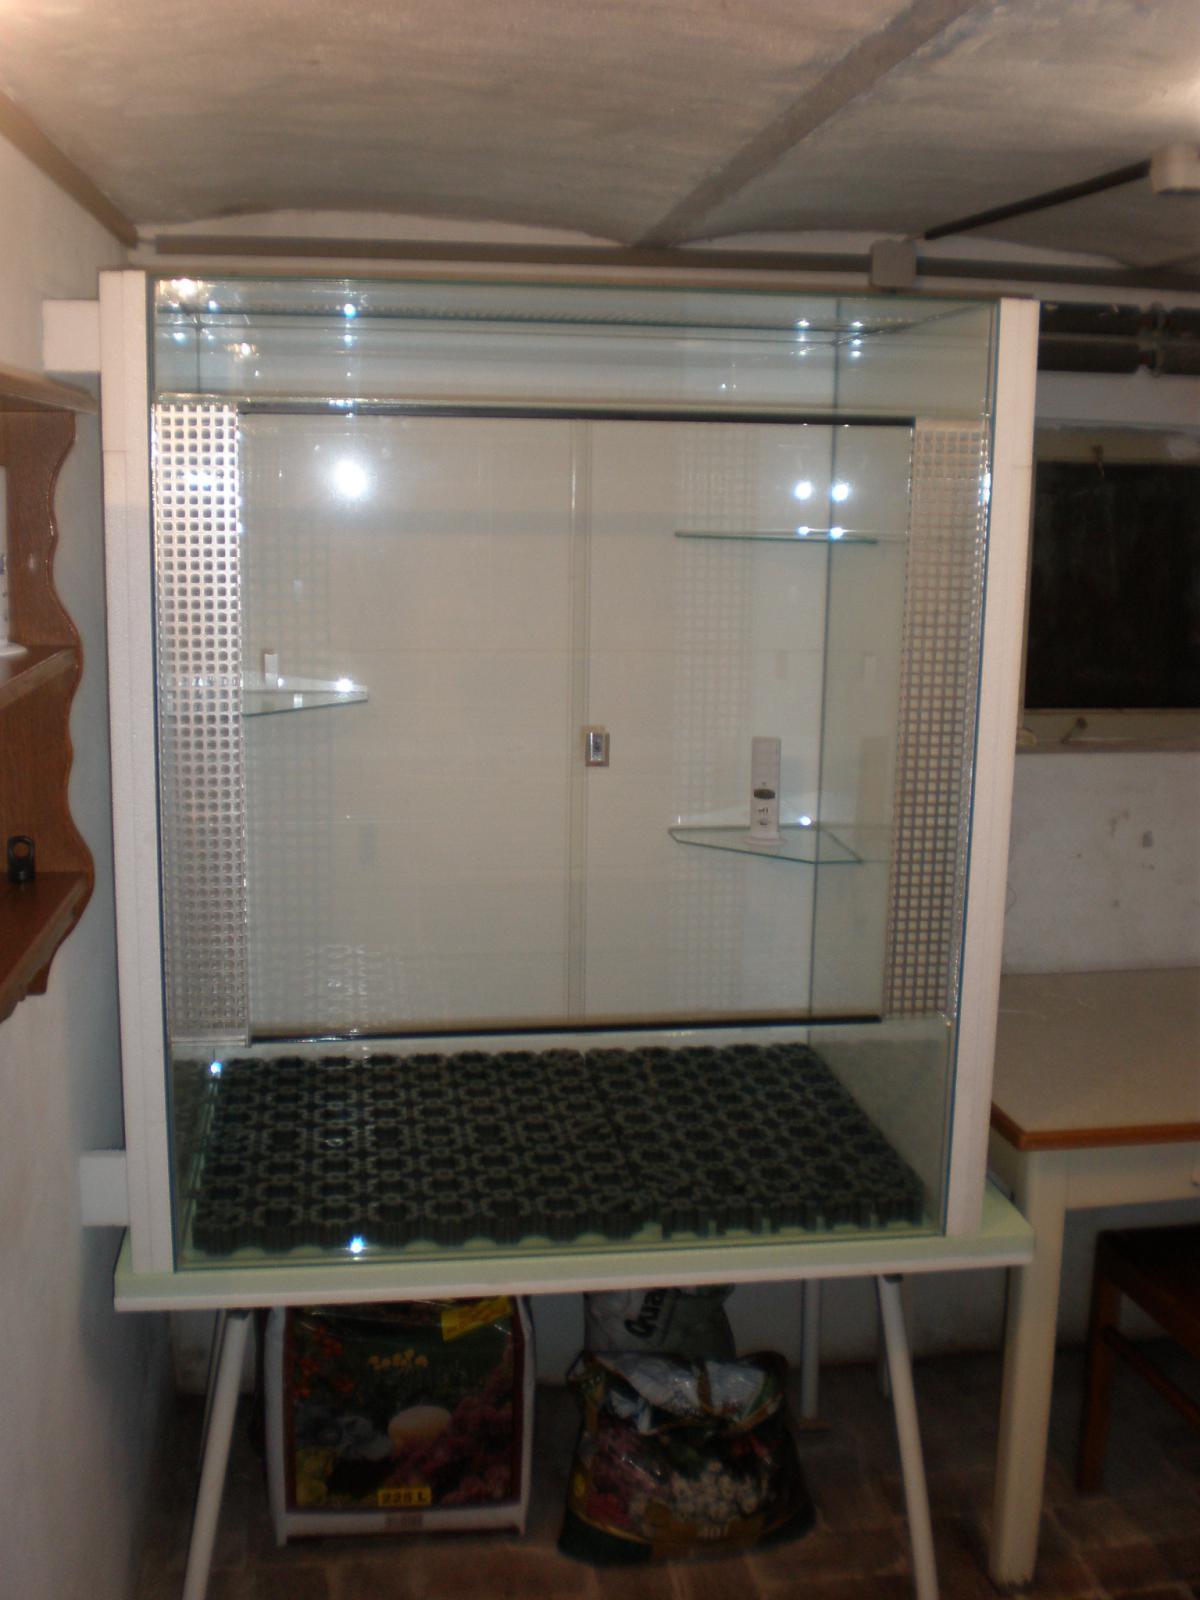 r ckwand aquarium selber bauen kommode solo loddenkemper just another wordpress sitehome design. Black Bedroom Furniture Sets. Home Design Ideas